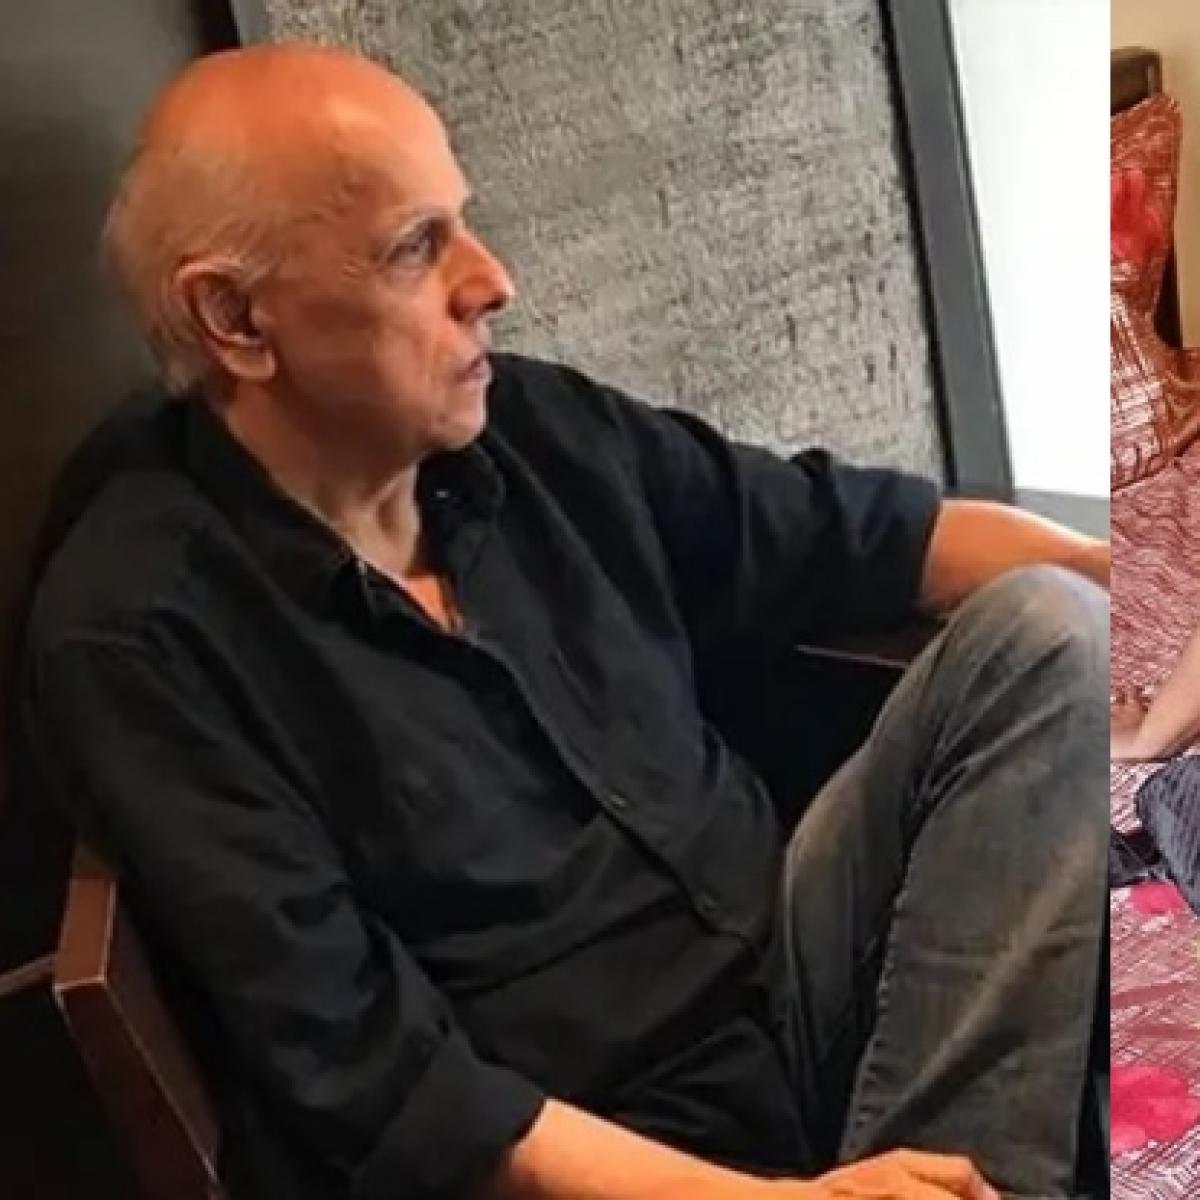 Mahesh Bhatt's relative Luviena Lodh accuses filmmaker of harassment, calls him 'biggest don of the industry'